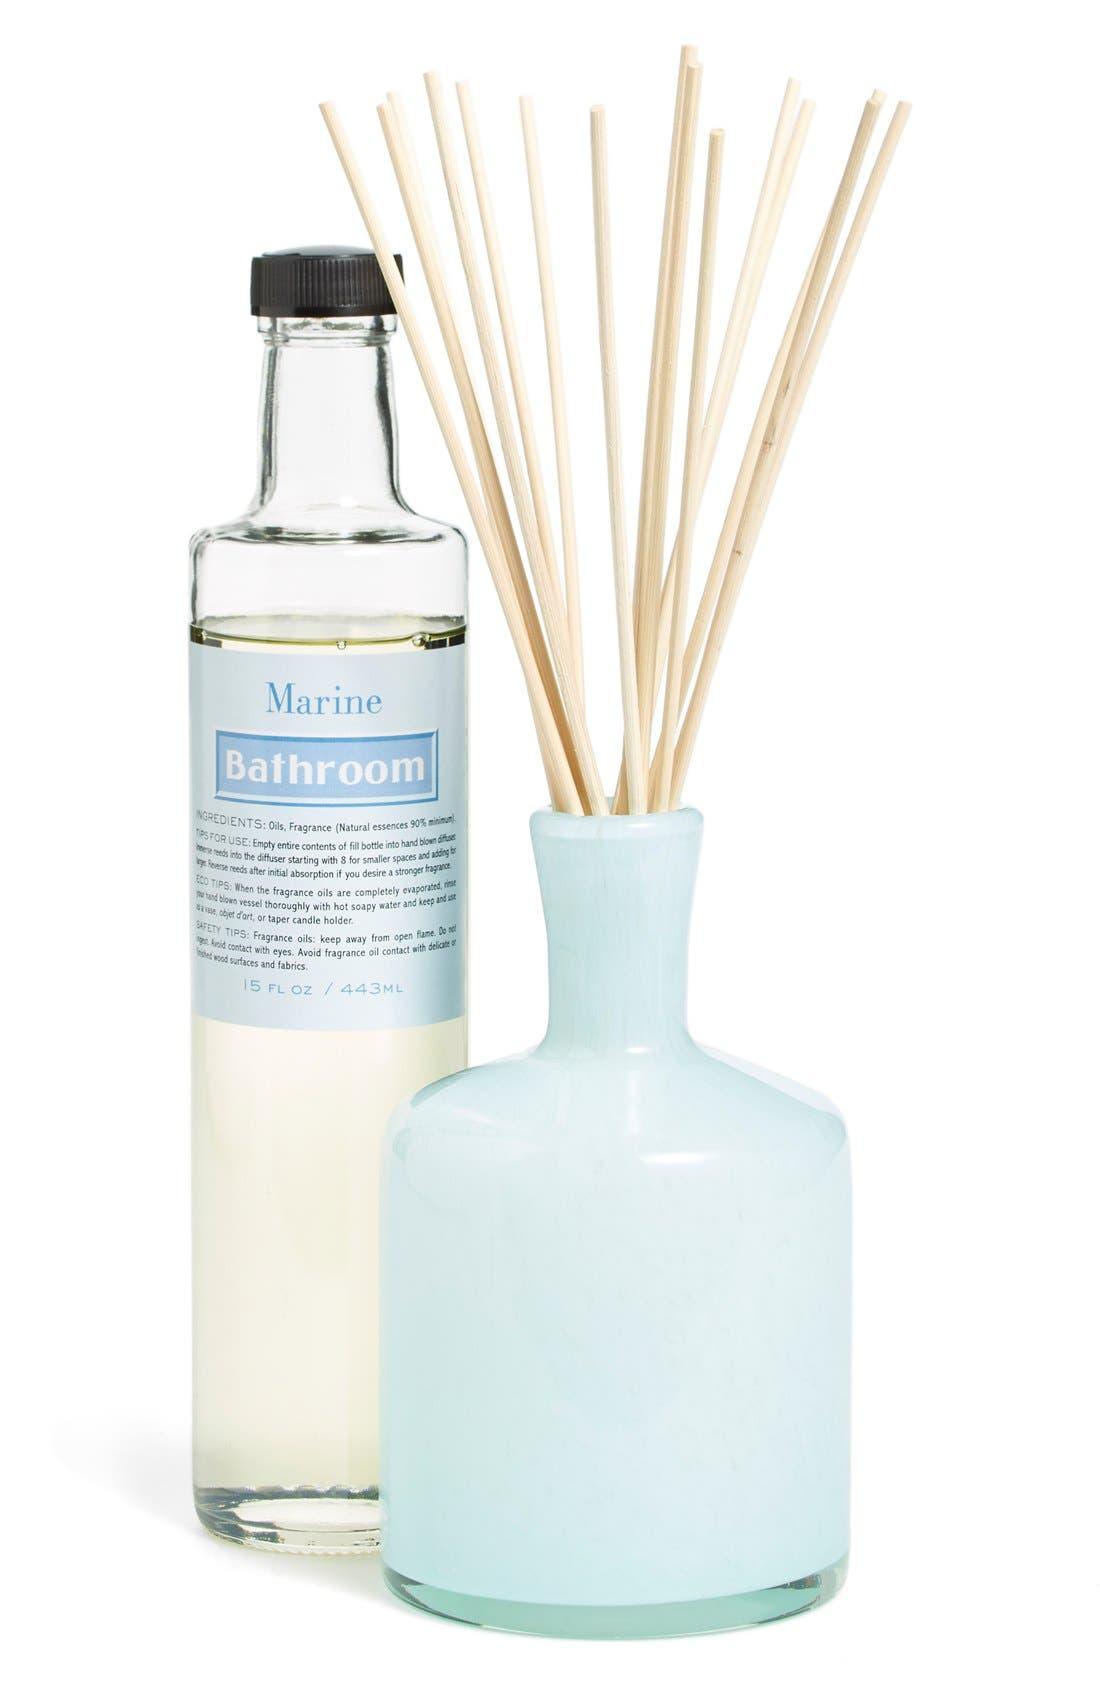 'Marine - Bathroom' Fragrance Diffuser,                             Main thumbnail 1, color,                             NO COLOR